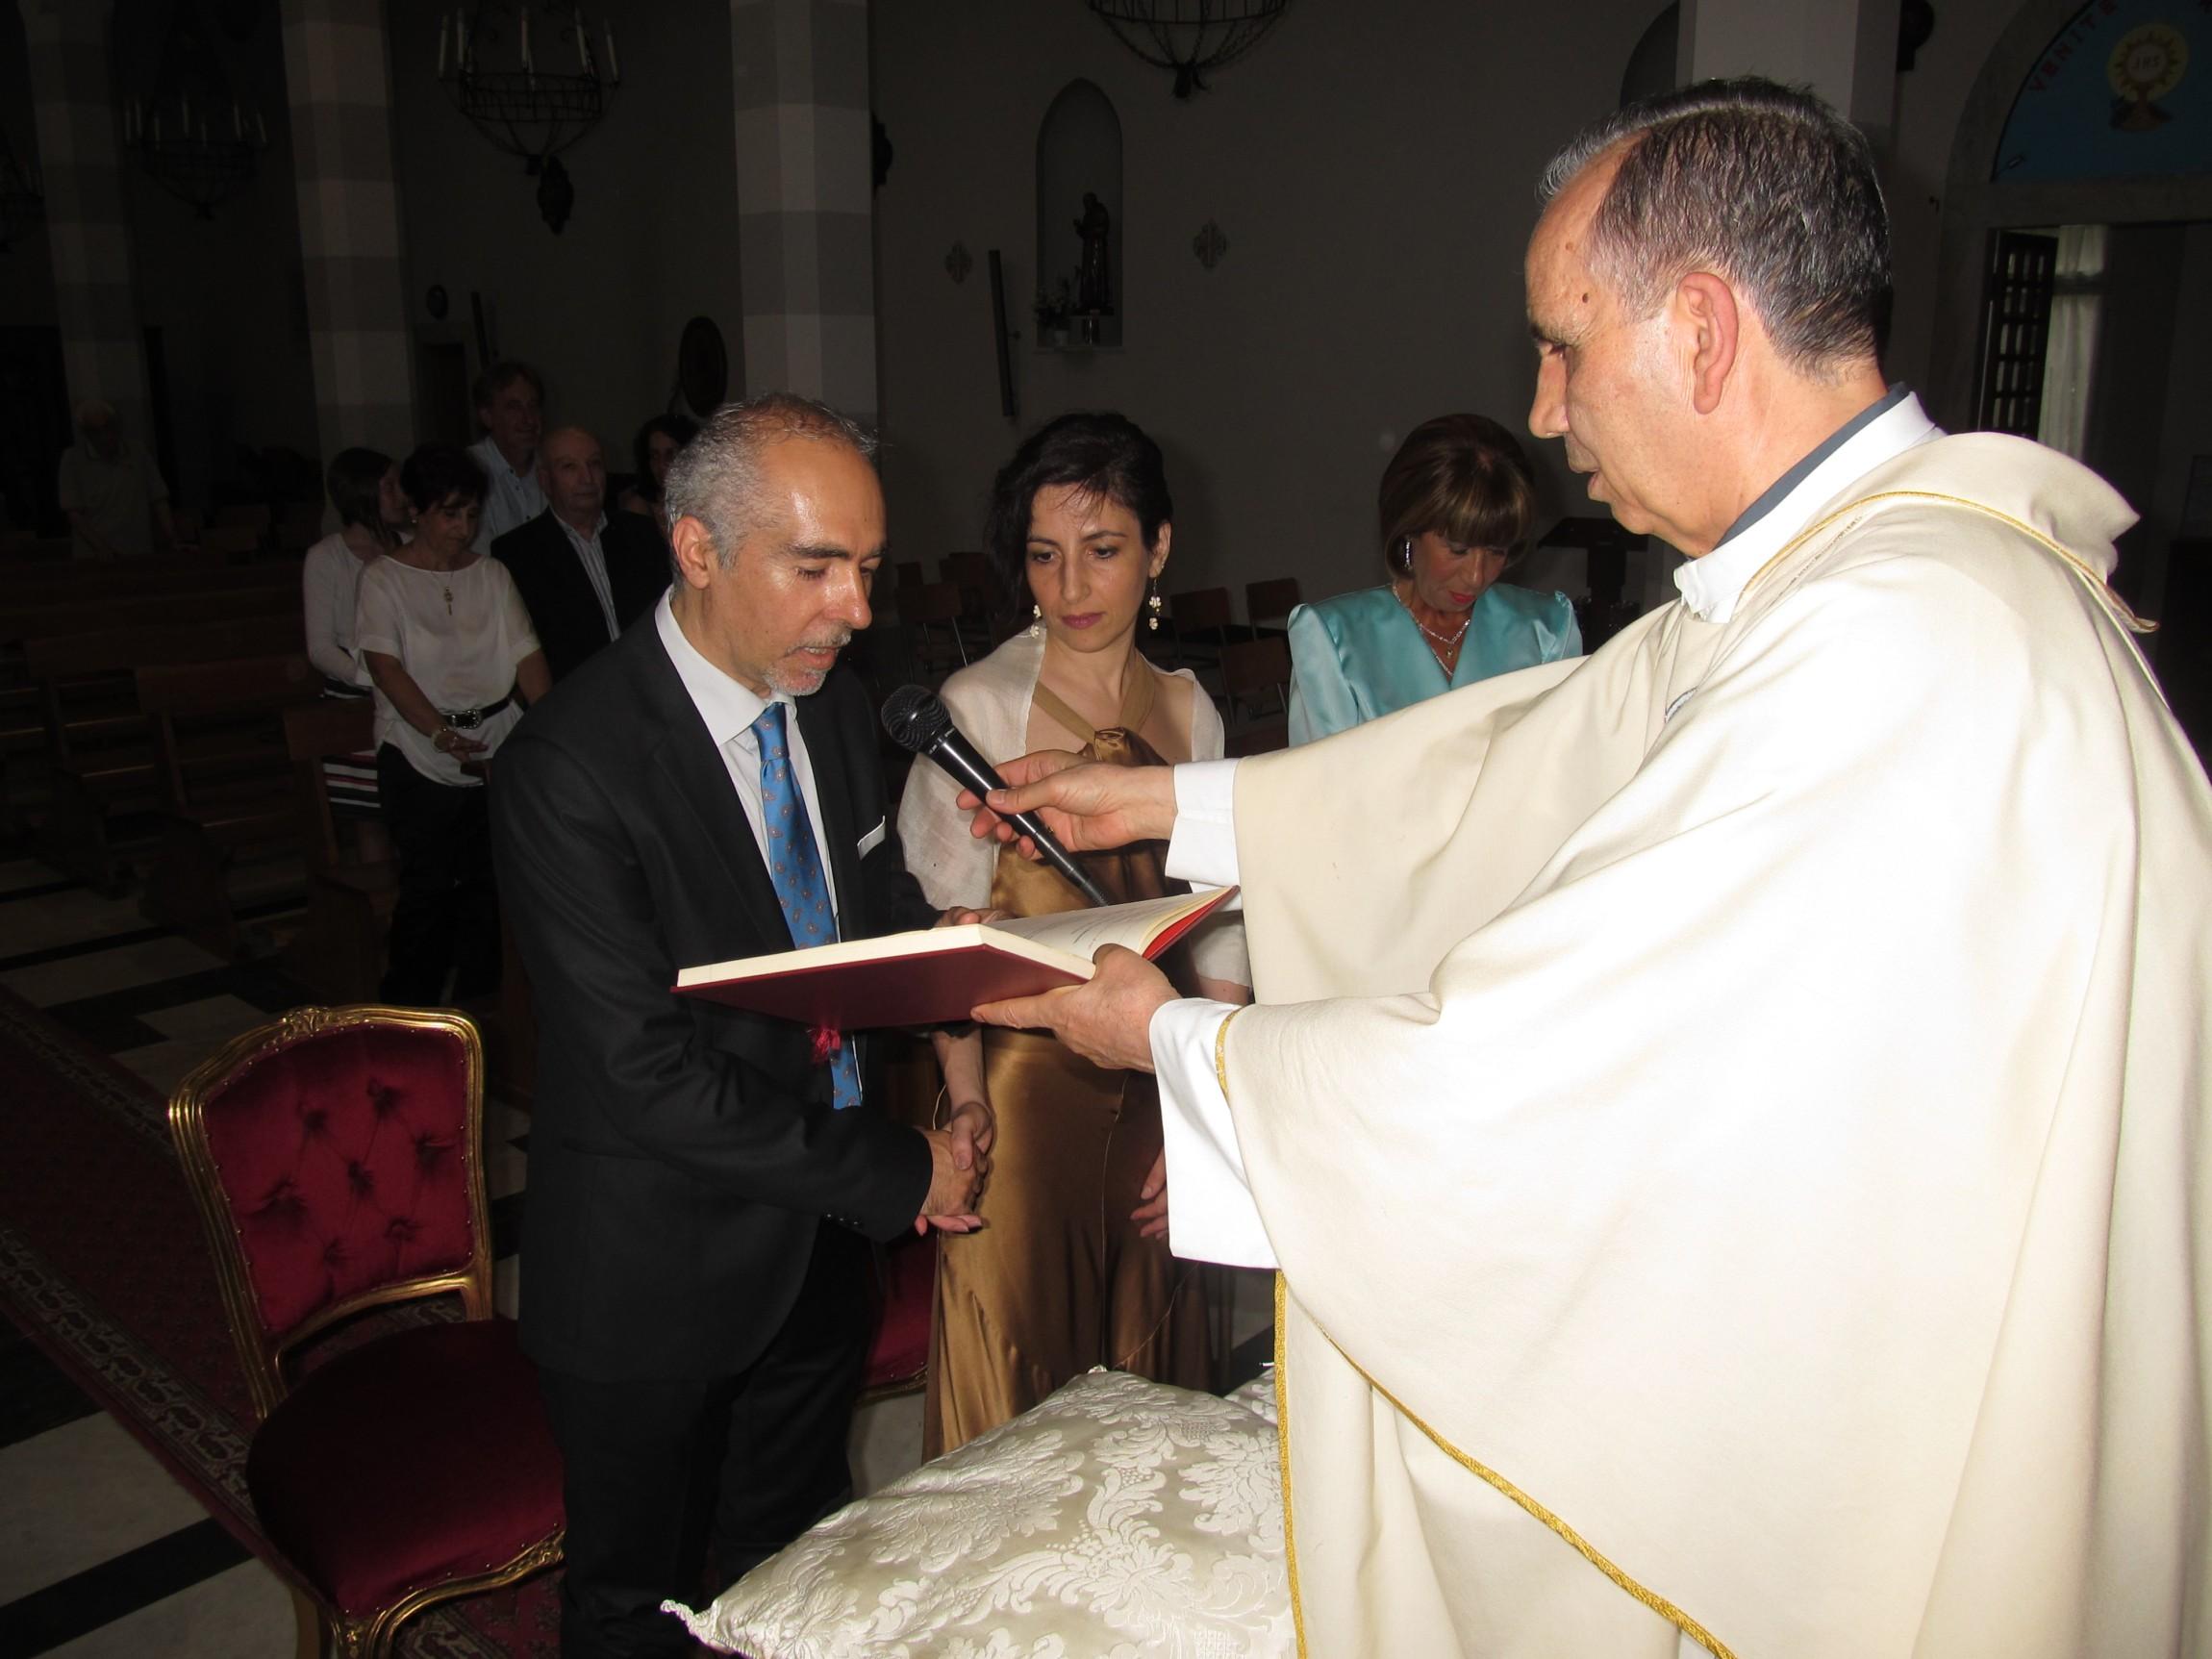 matrimonio_e_battesimo_piras_marsala_2014-06-28-16-03-51